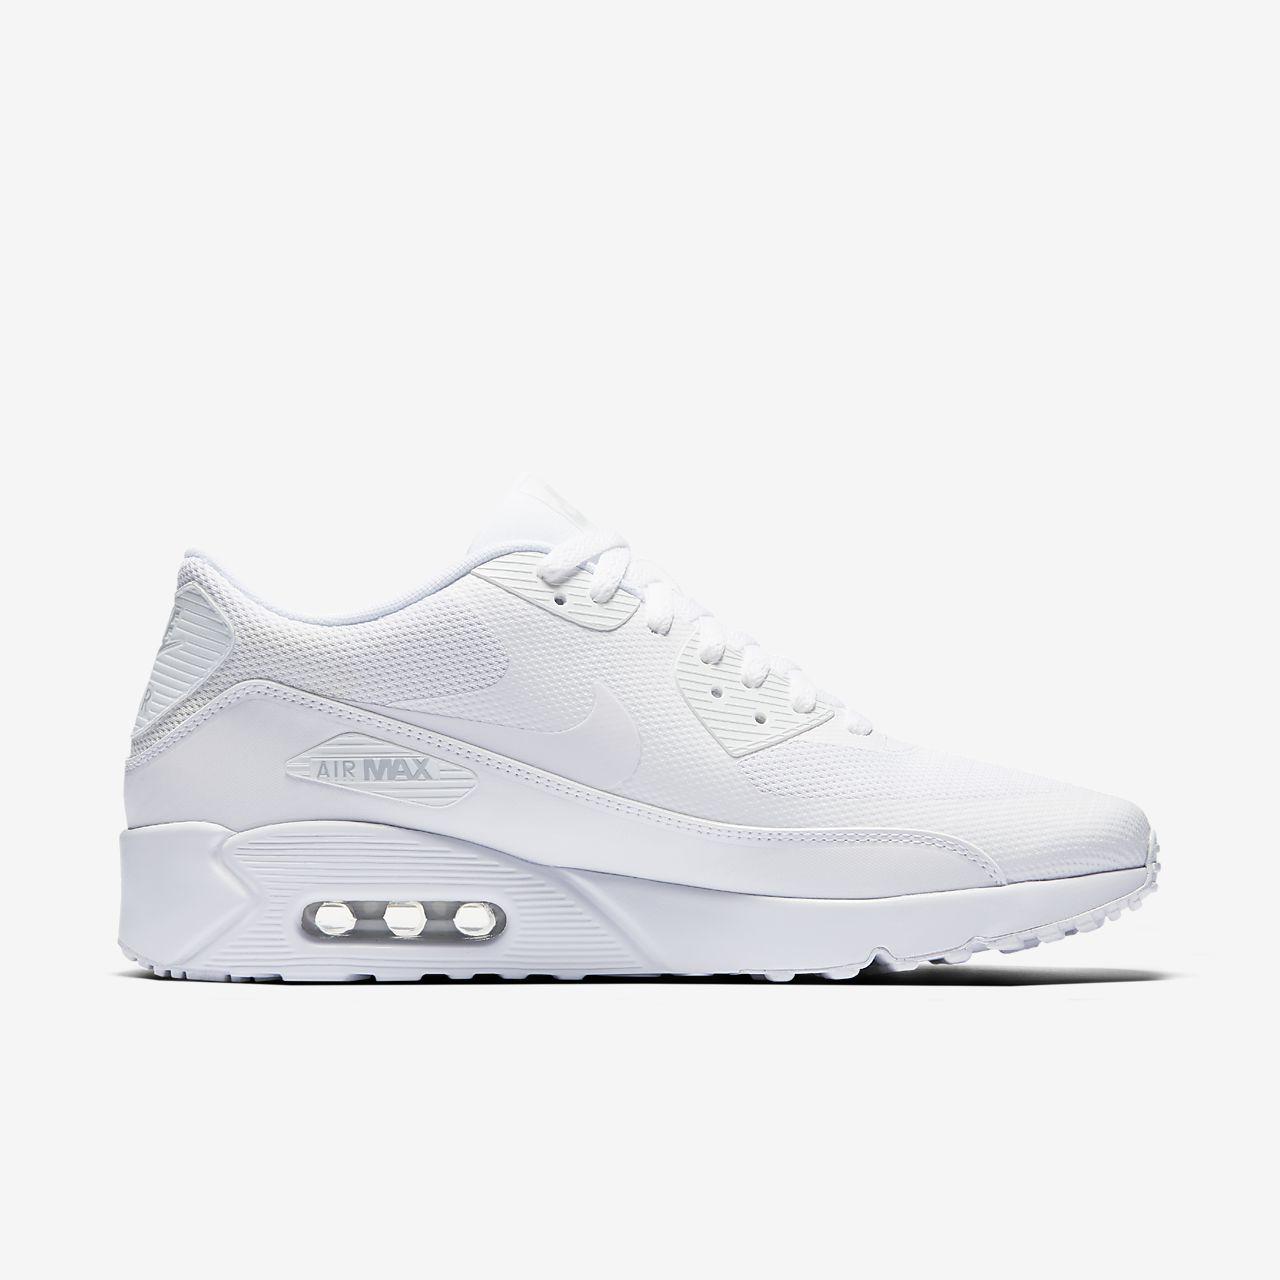 ... Nike Air Max 90 Ultra 2.0 Essential Men's Shoe